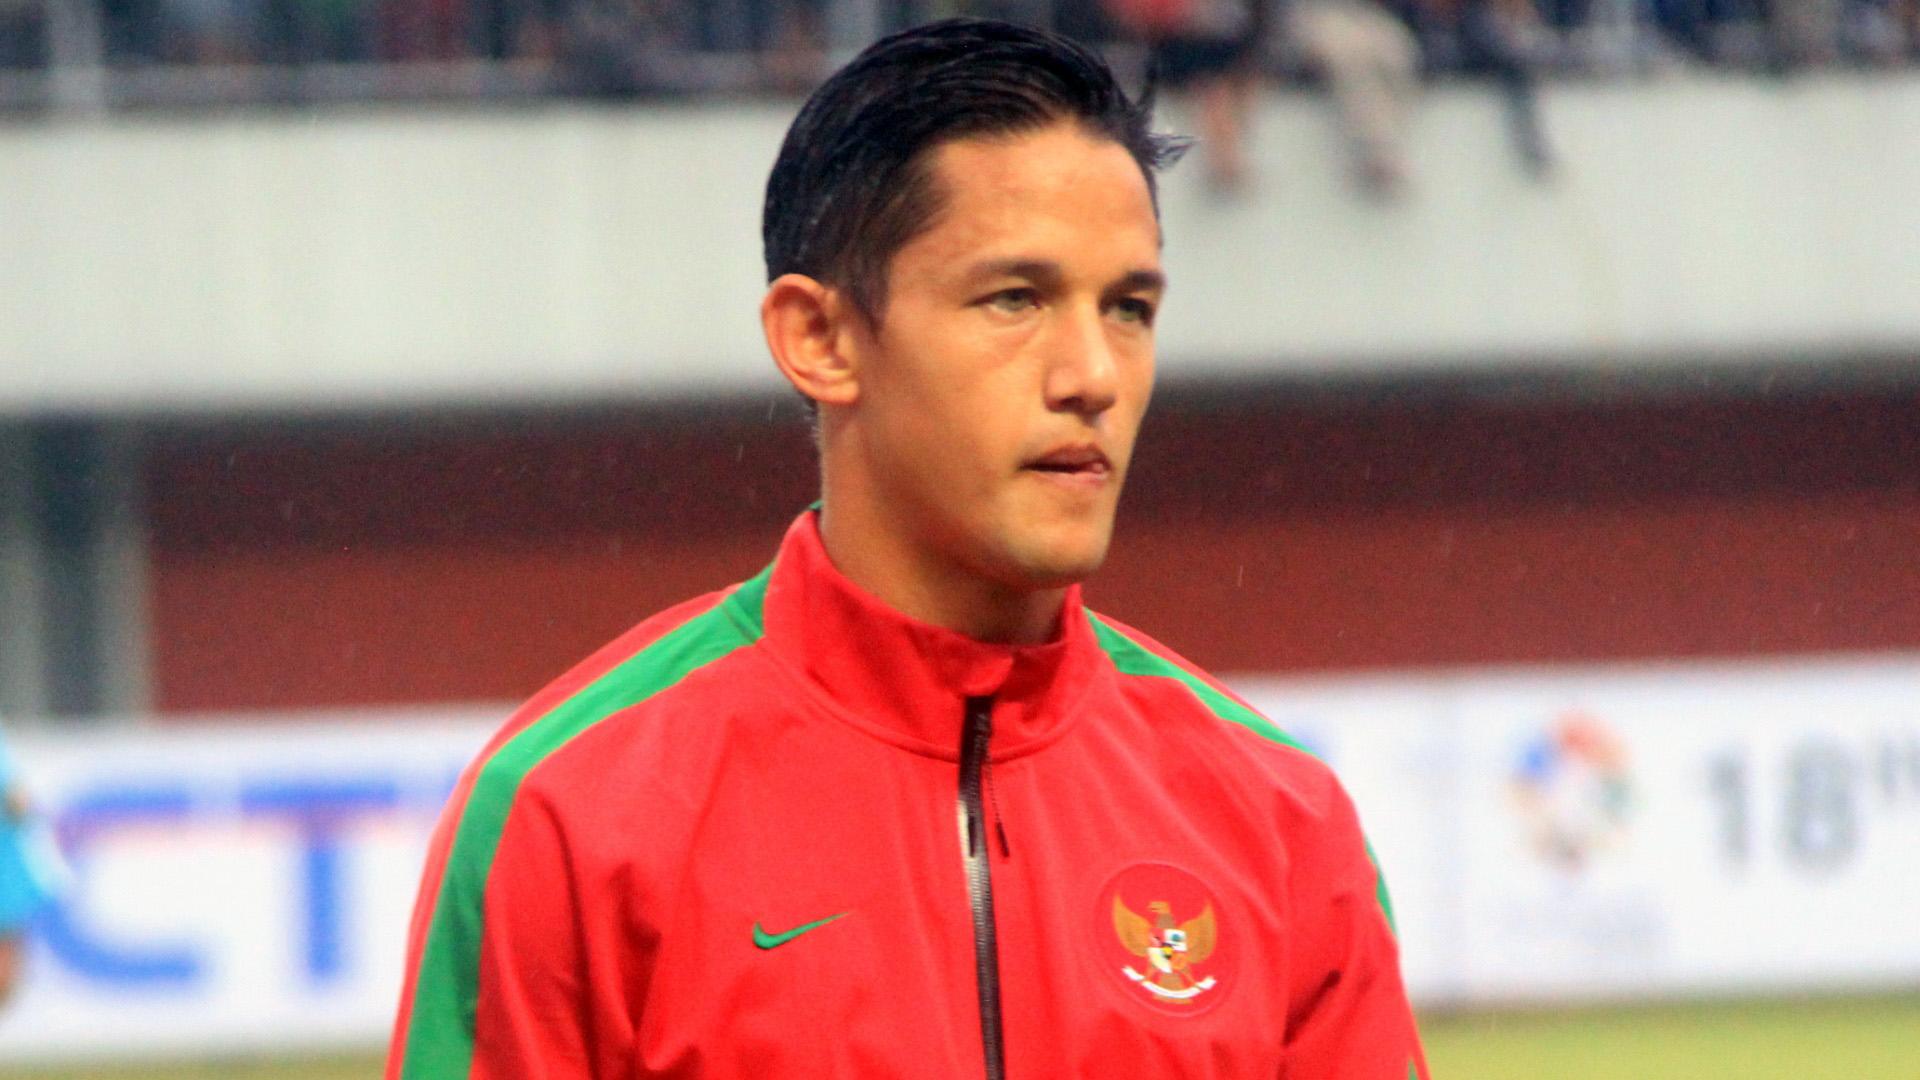 Pemain Sepak Bola Indonesia Terganteng